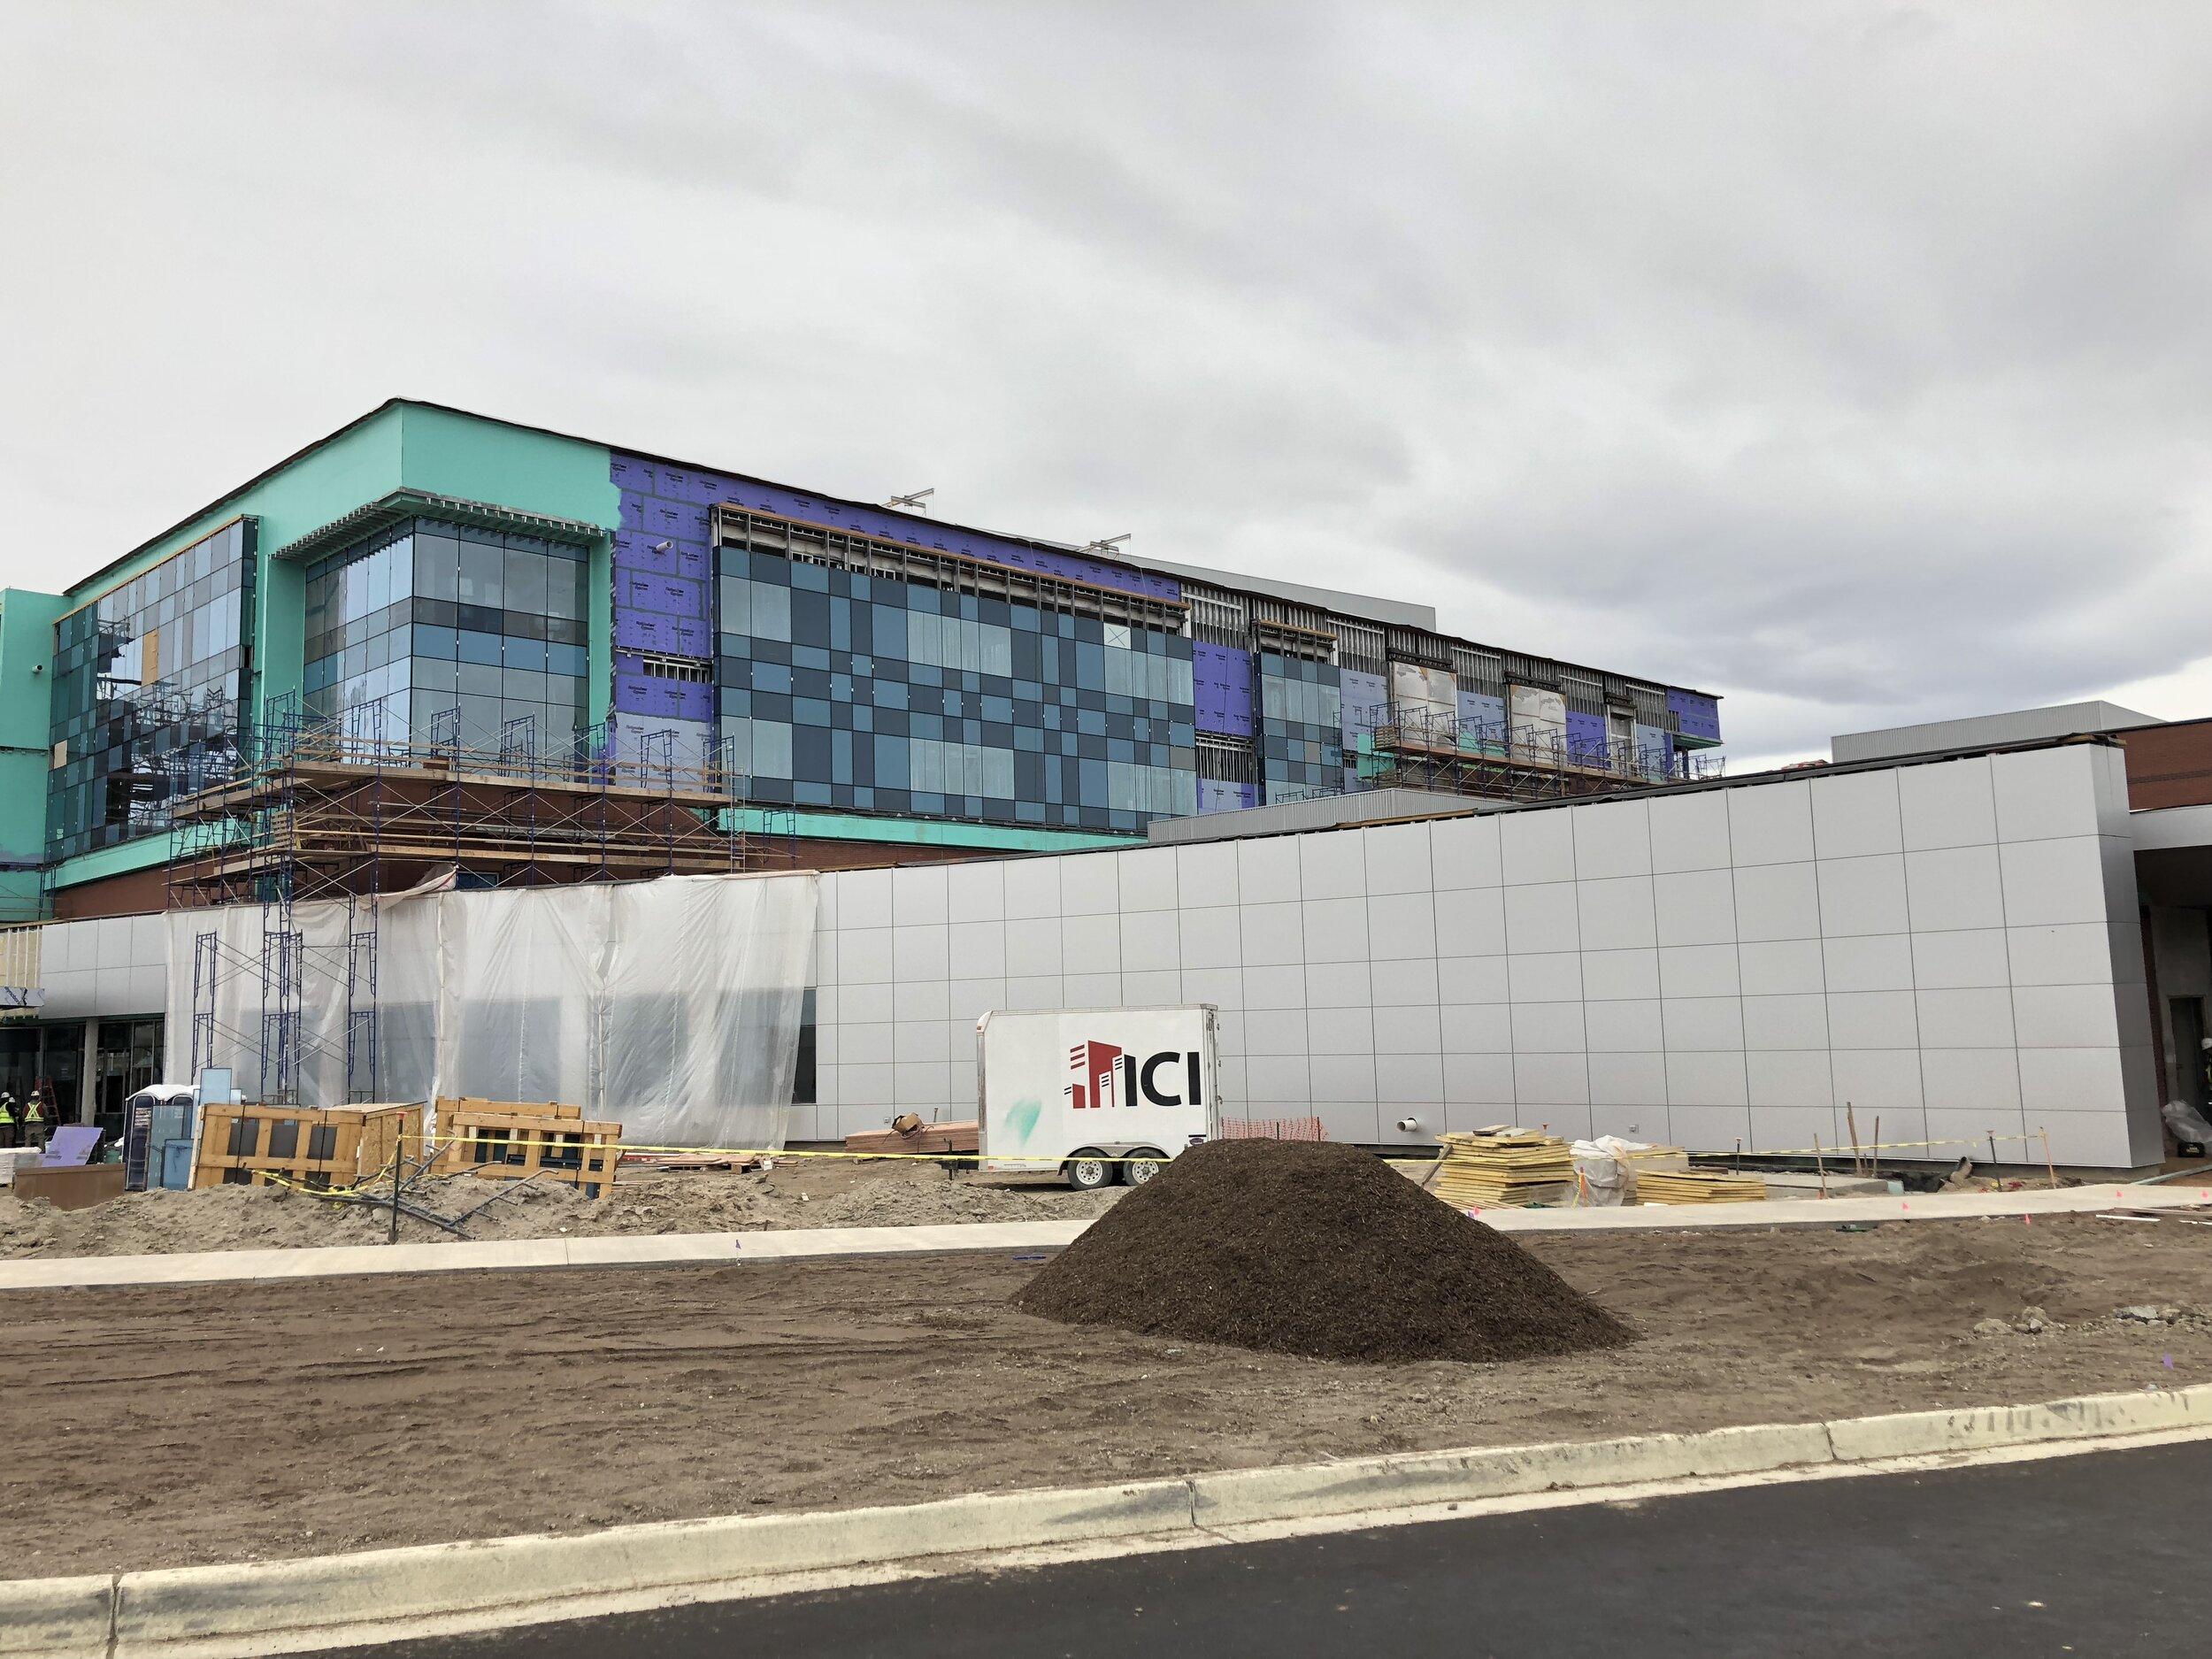 5-ICI-CHCO South.JPG